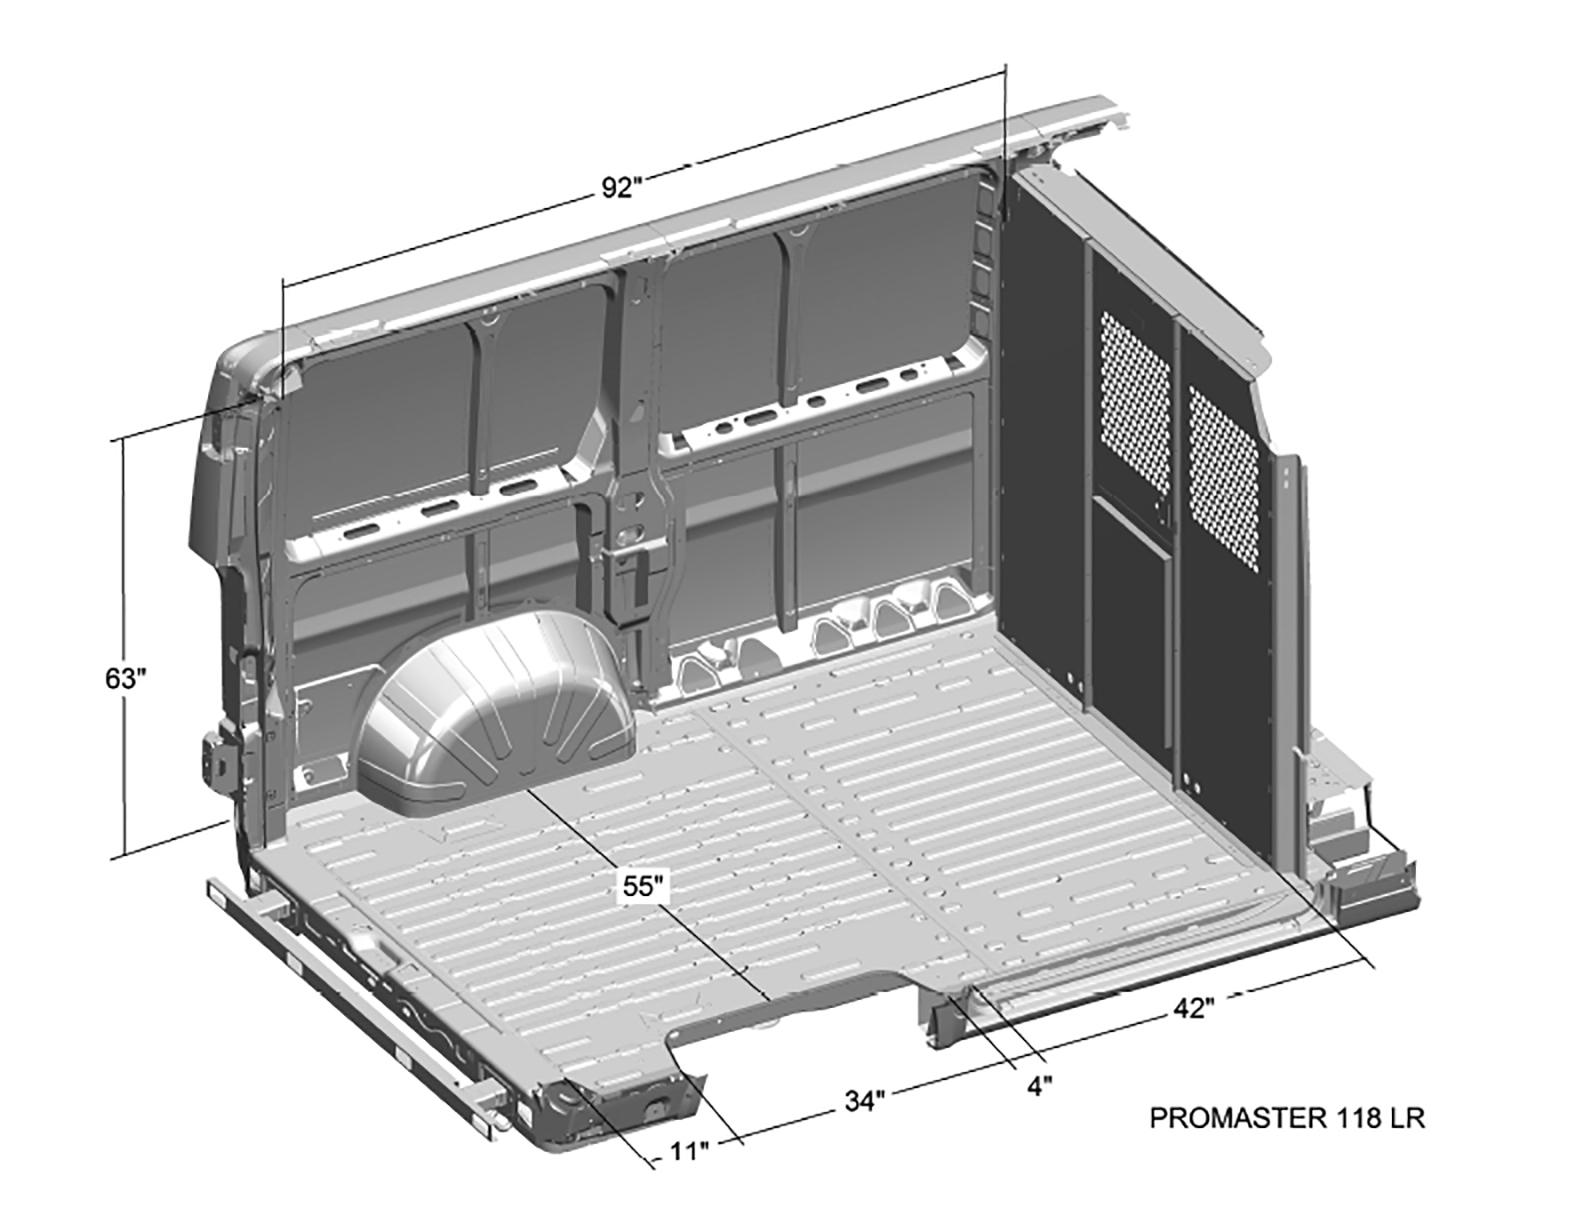 promaster-118-lr-w-dims-large.jpg